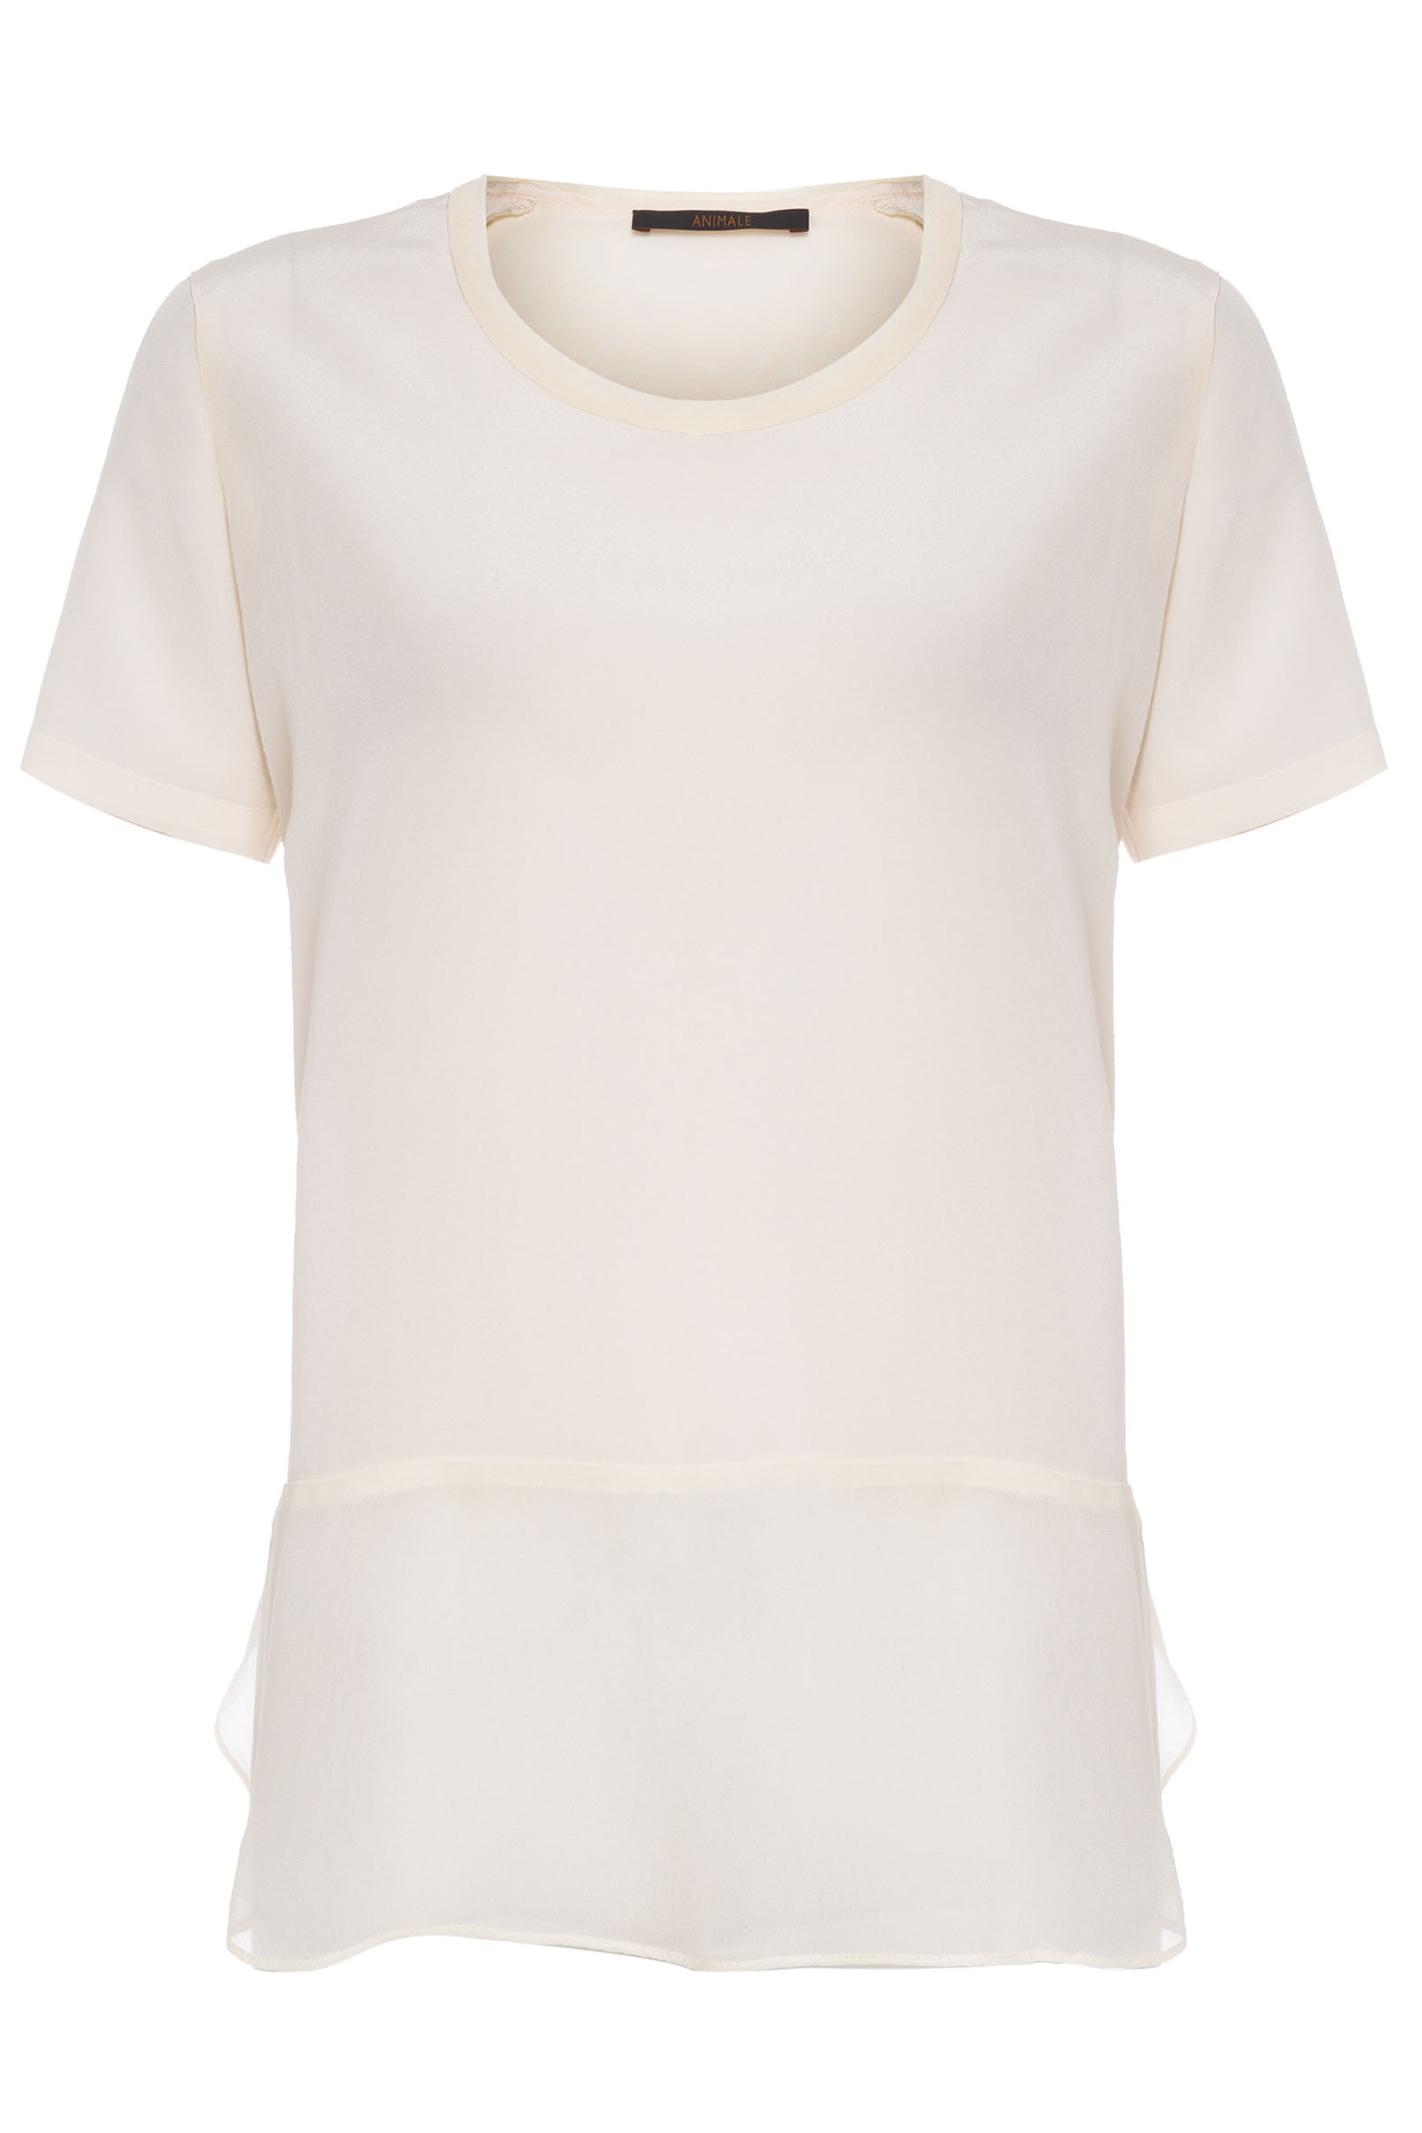 Blusa T-Shirt Mix Tecido